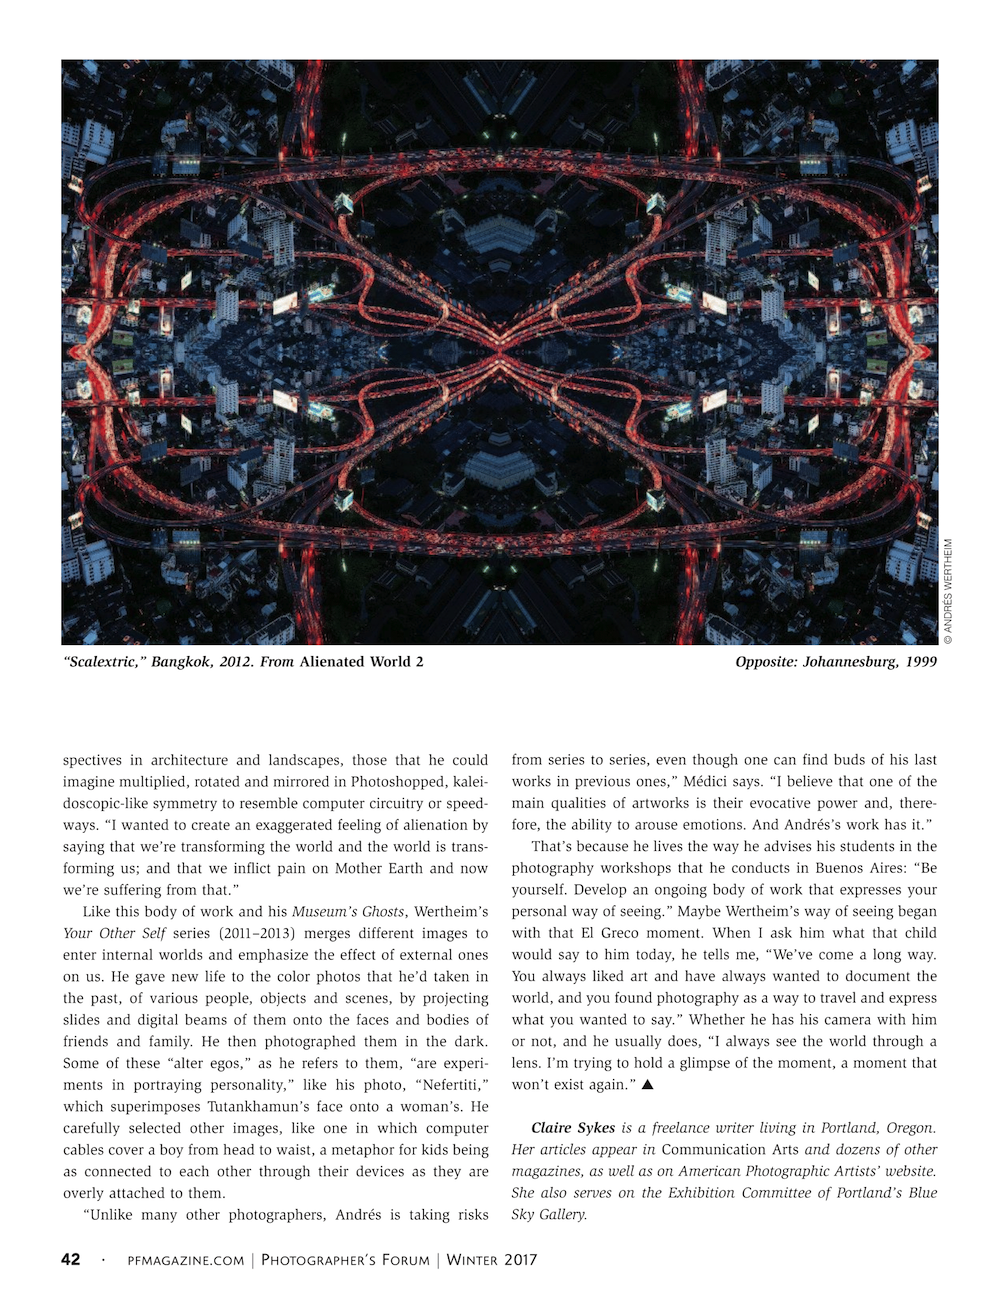 PFNOV17 Wertheim cropped PDF-09.png